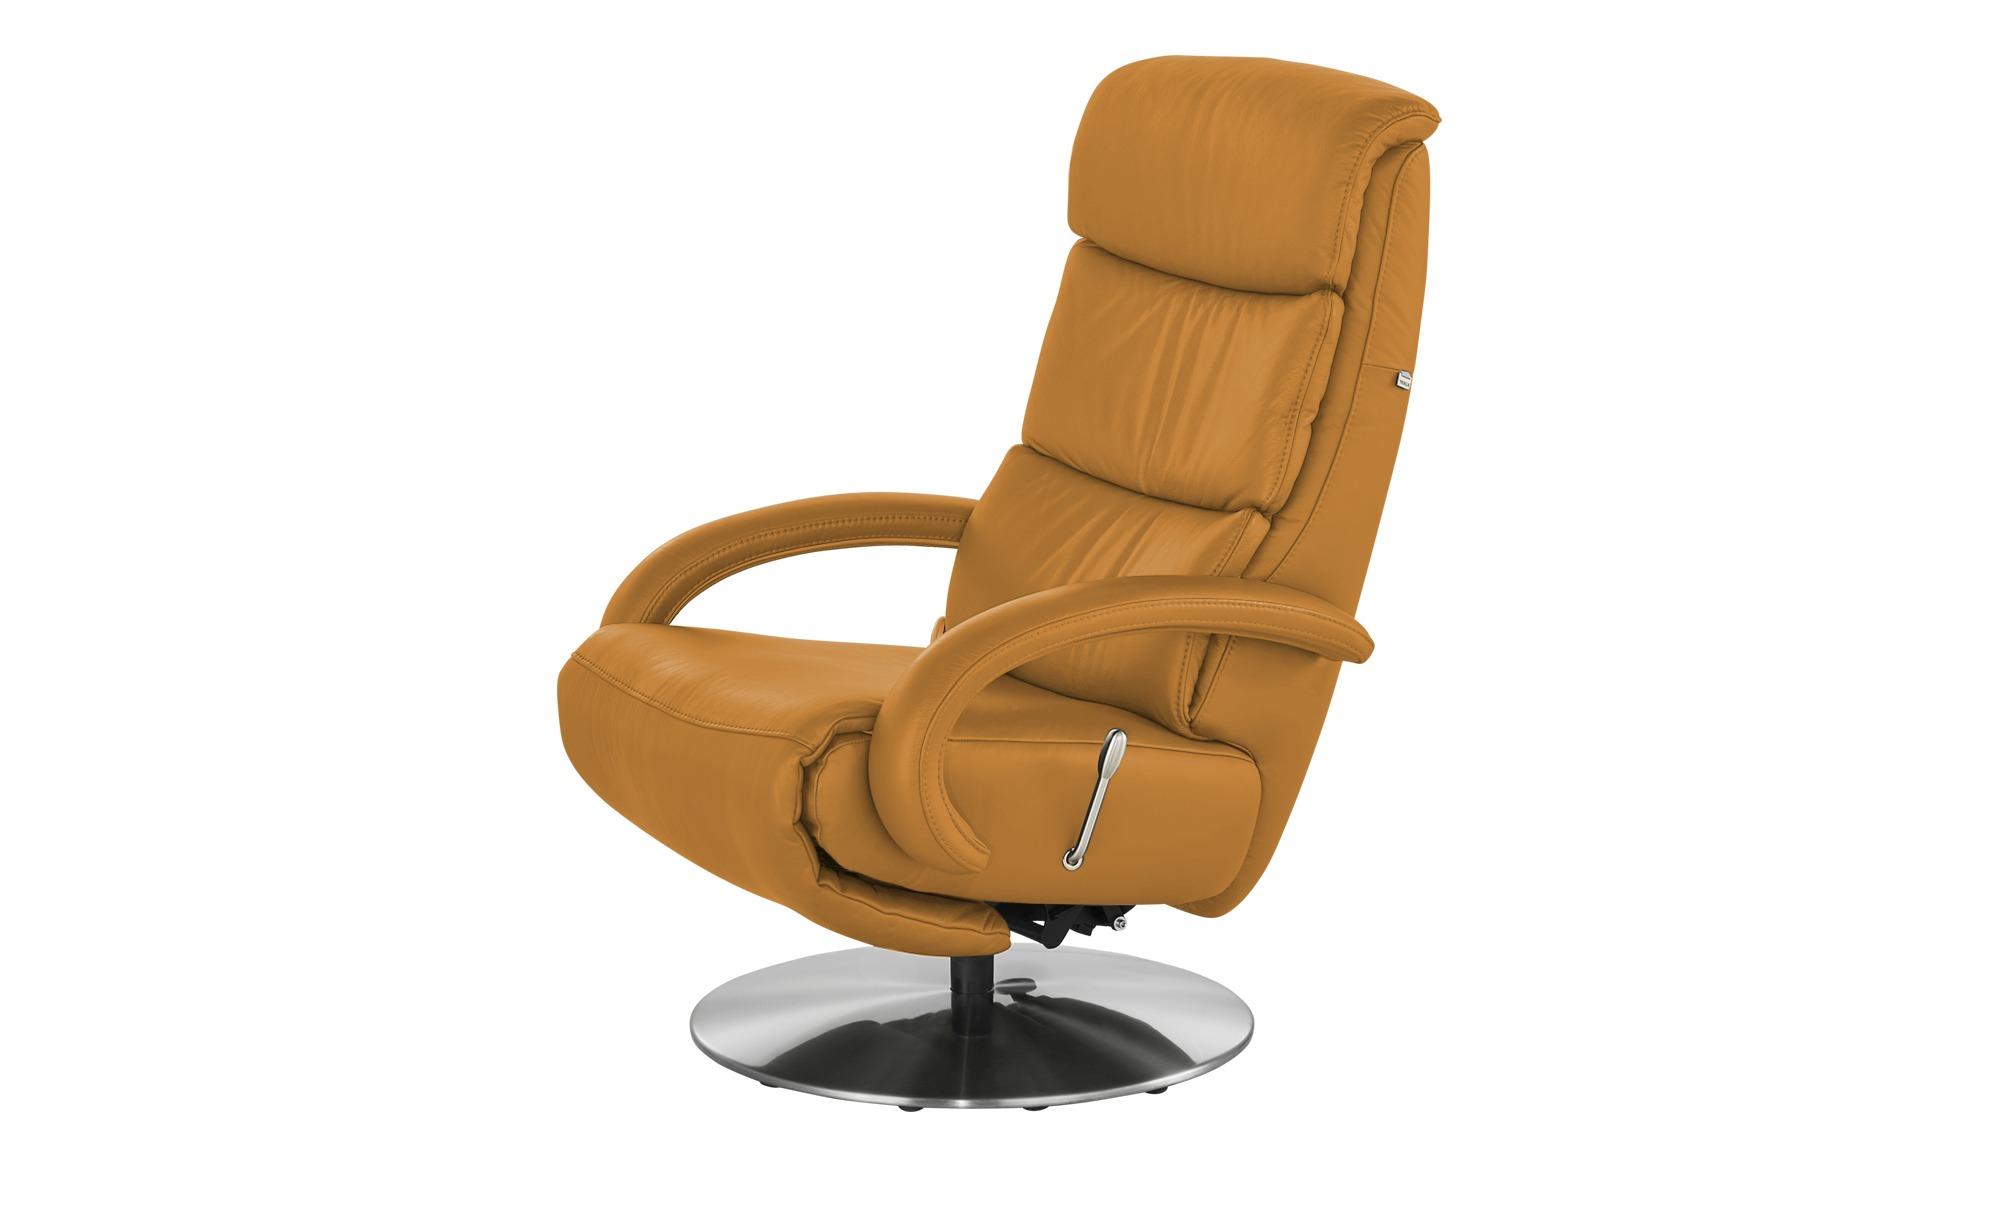 Hukla Leder-Relaxsessel  Florian ¦ orange ¦ Maße (cm): B: 73 H: 109 T: 91 Polstermöbel > Sessel > Fernsehsessel - Höffner